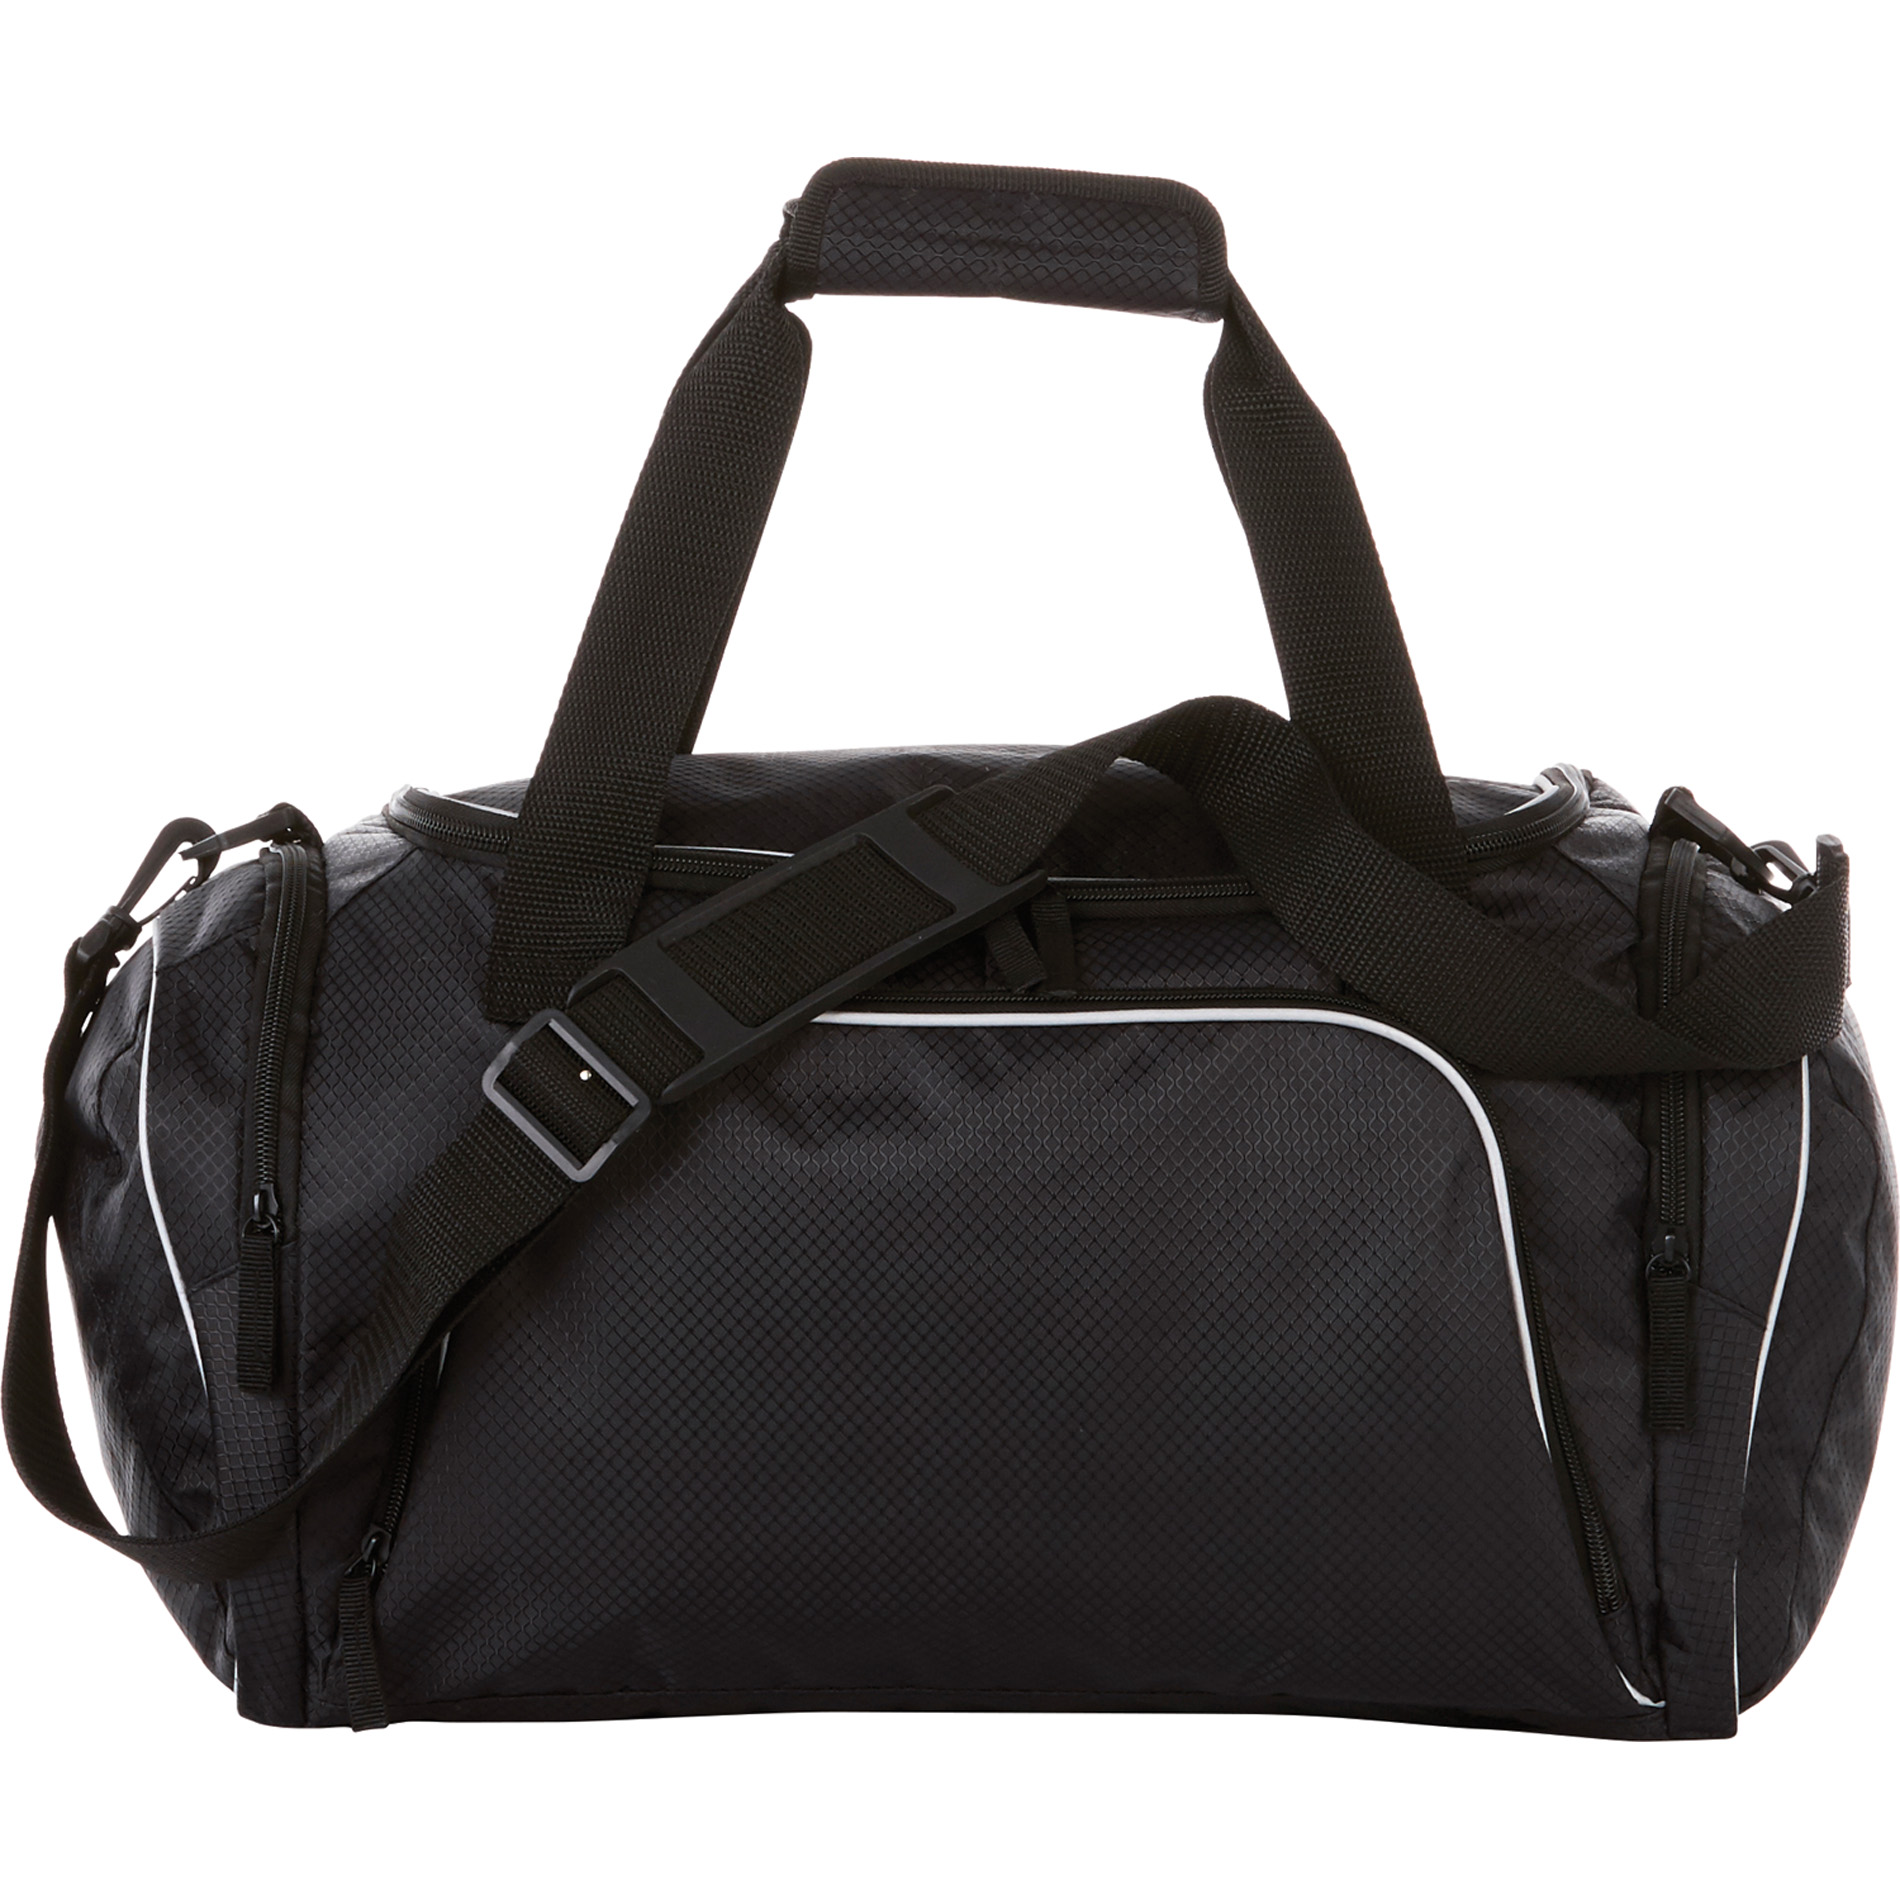 "LEEDS 4700-70 - Piper 20"" Sport Duffel Bag"